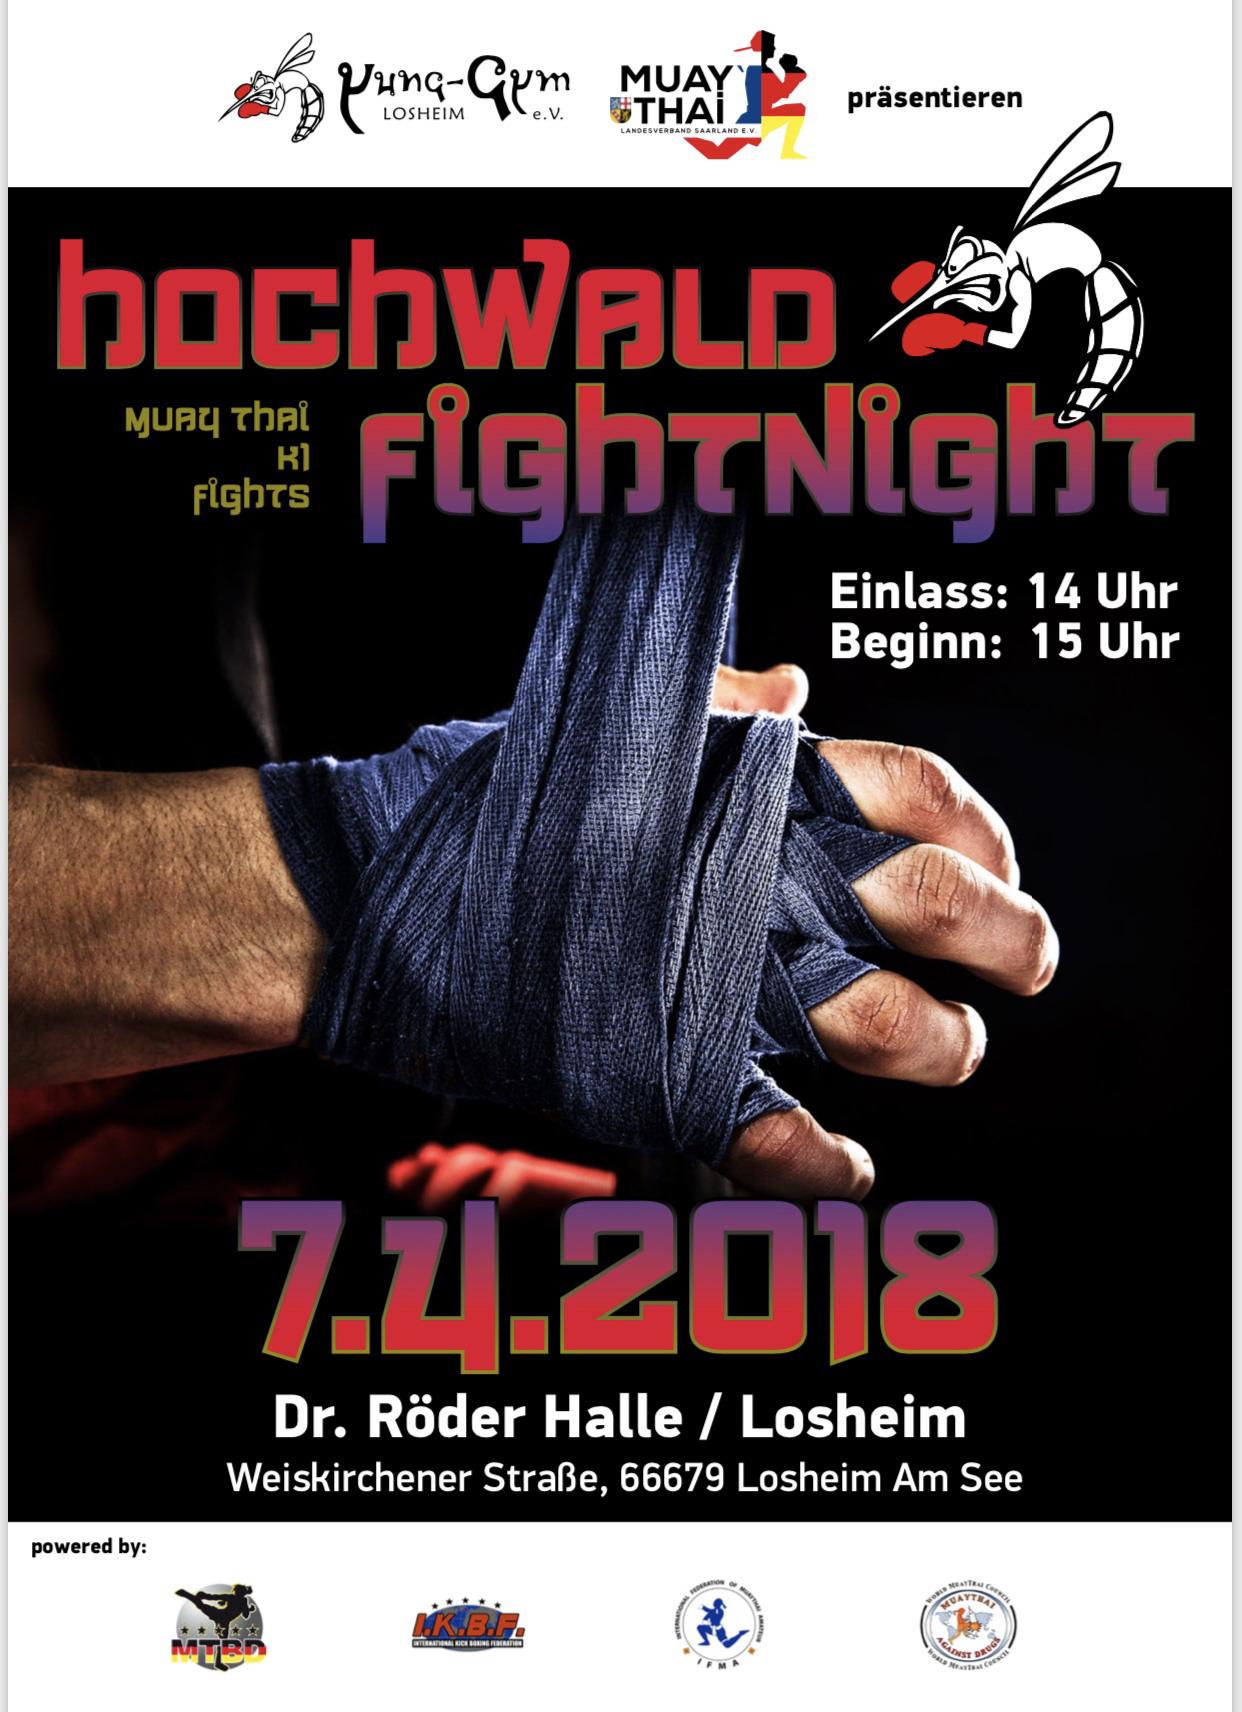 Hochwald Fightnight